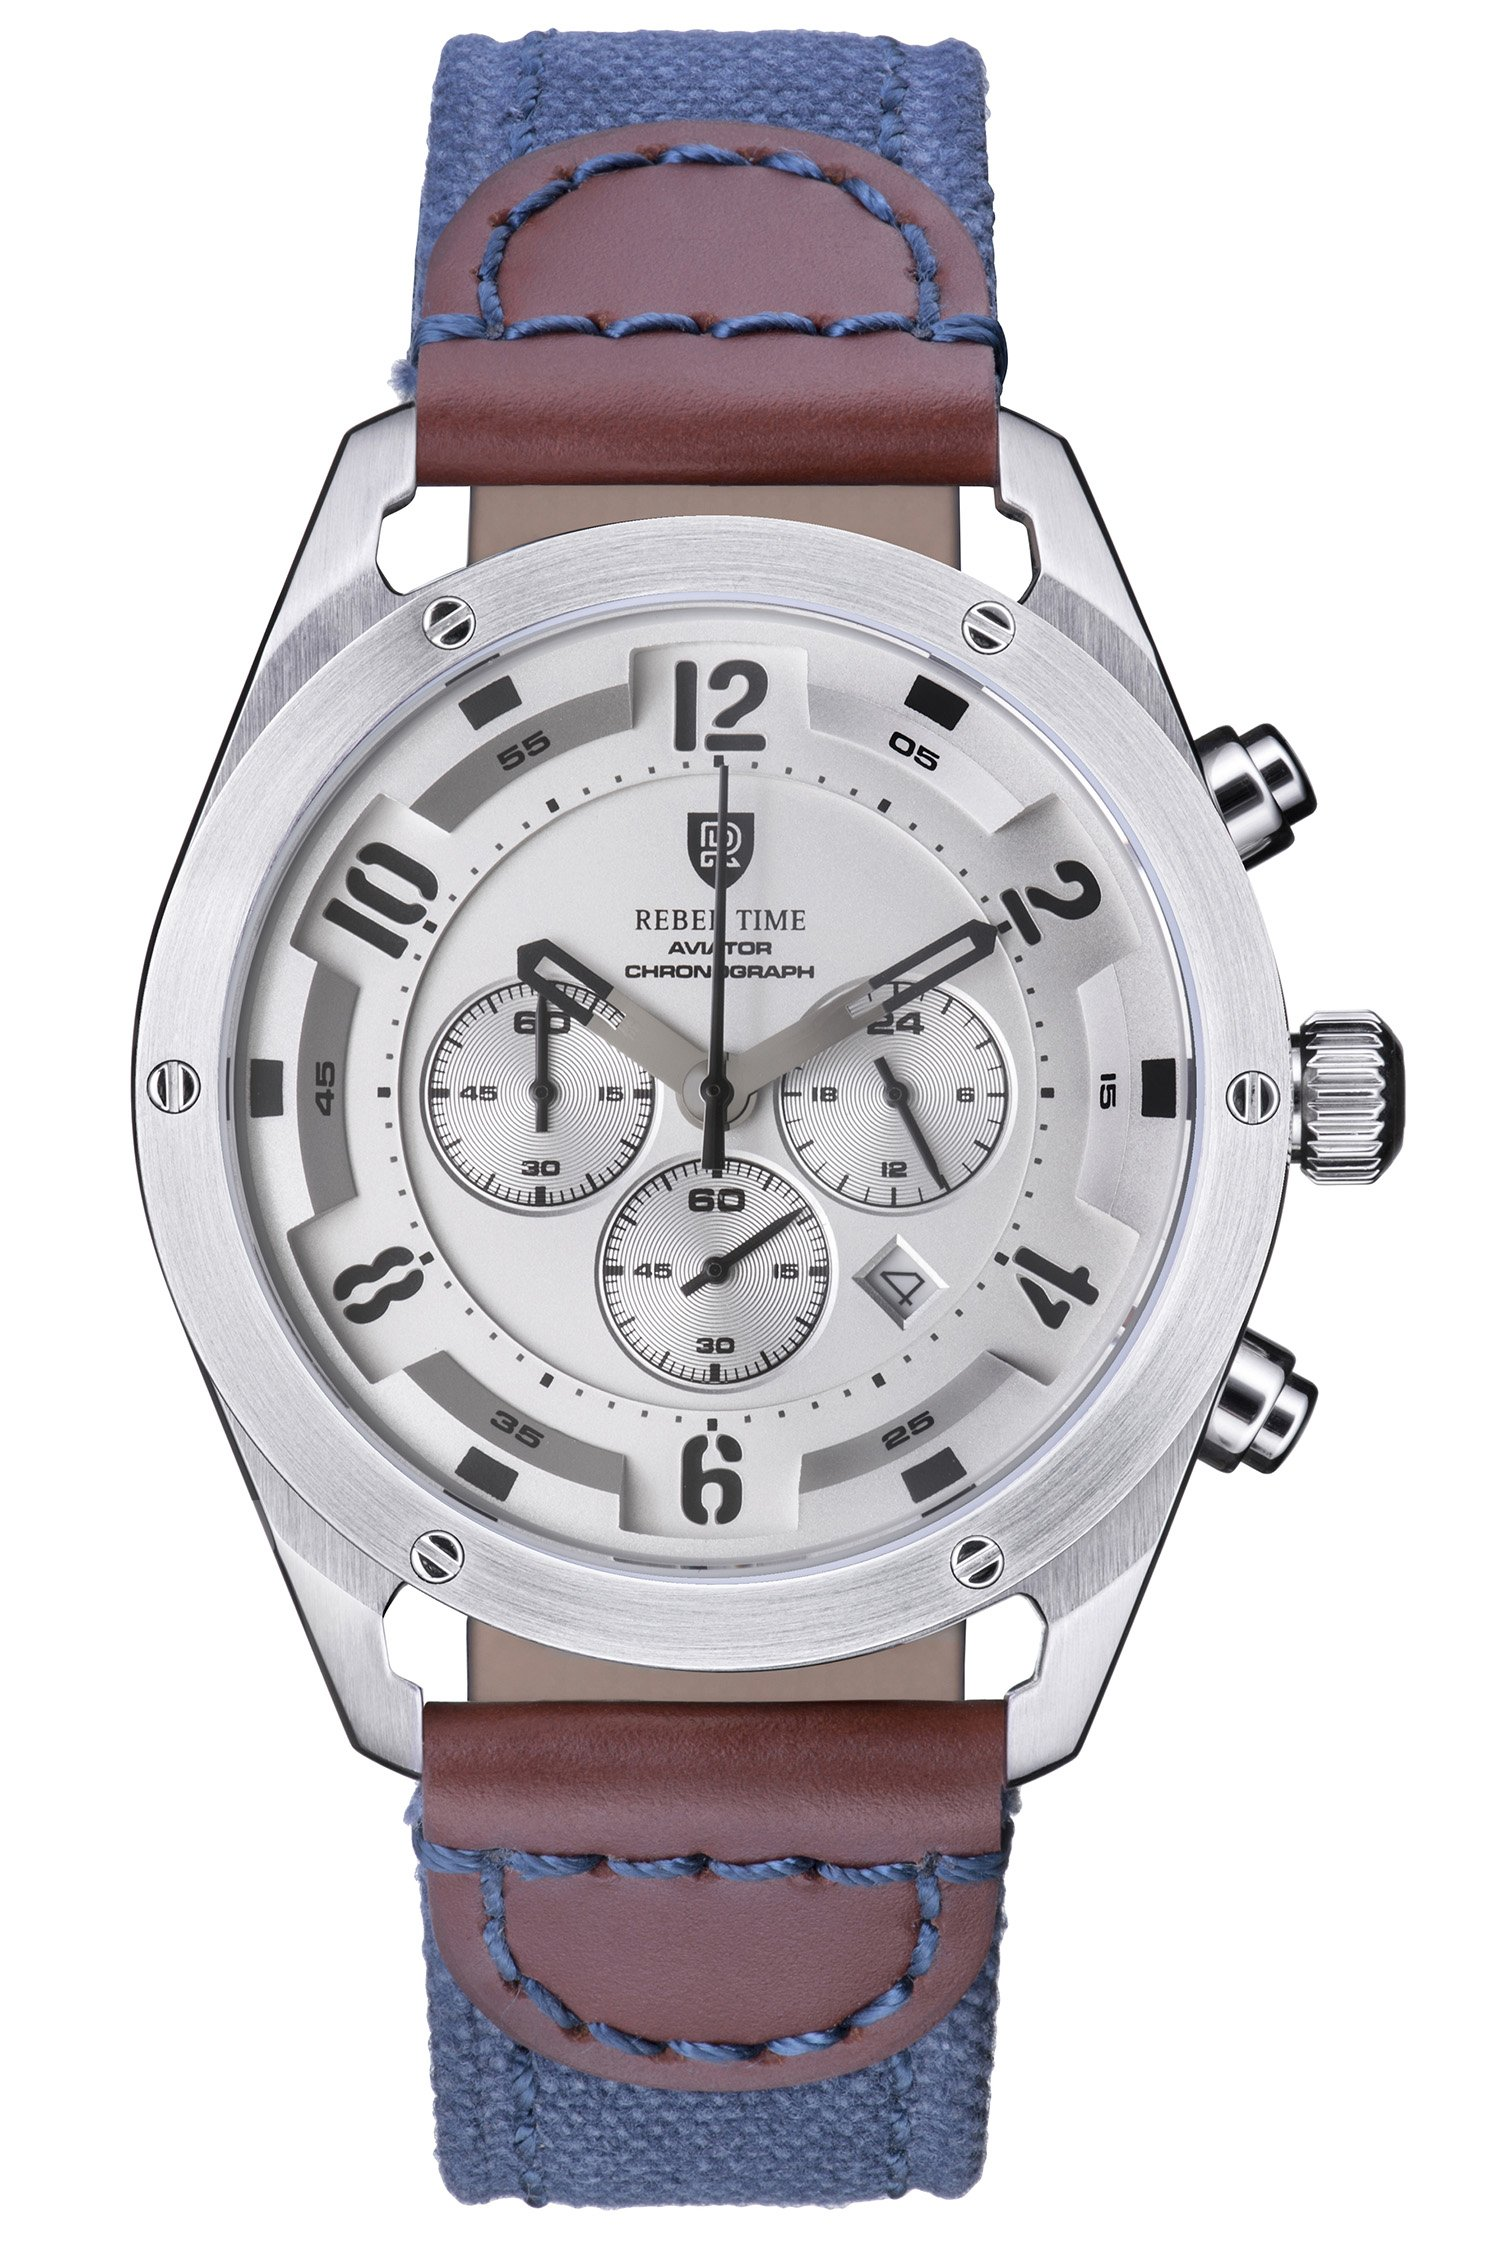 Rebel Men's Aviator Silver Stainless Steel Chronograph Pilot Watch 100 Meter WR